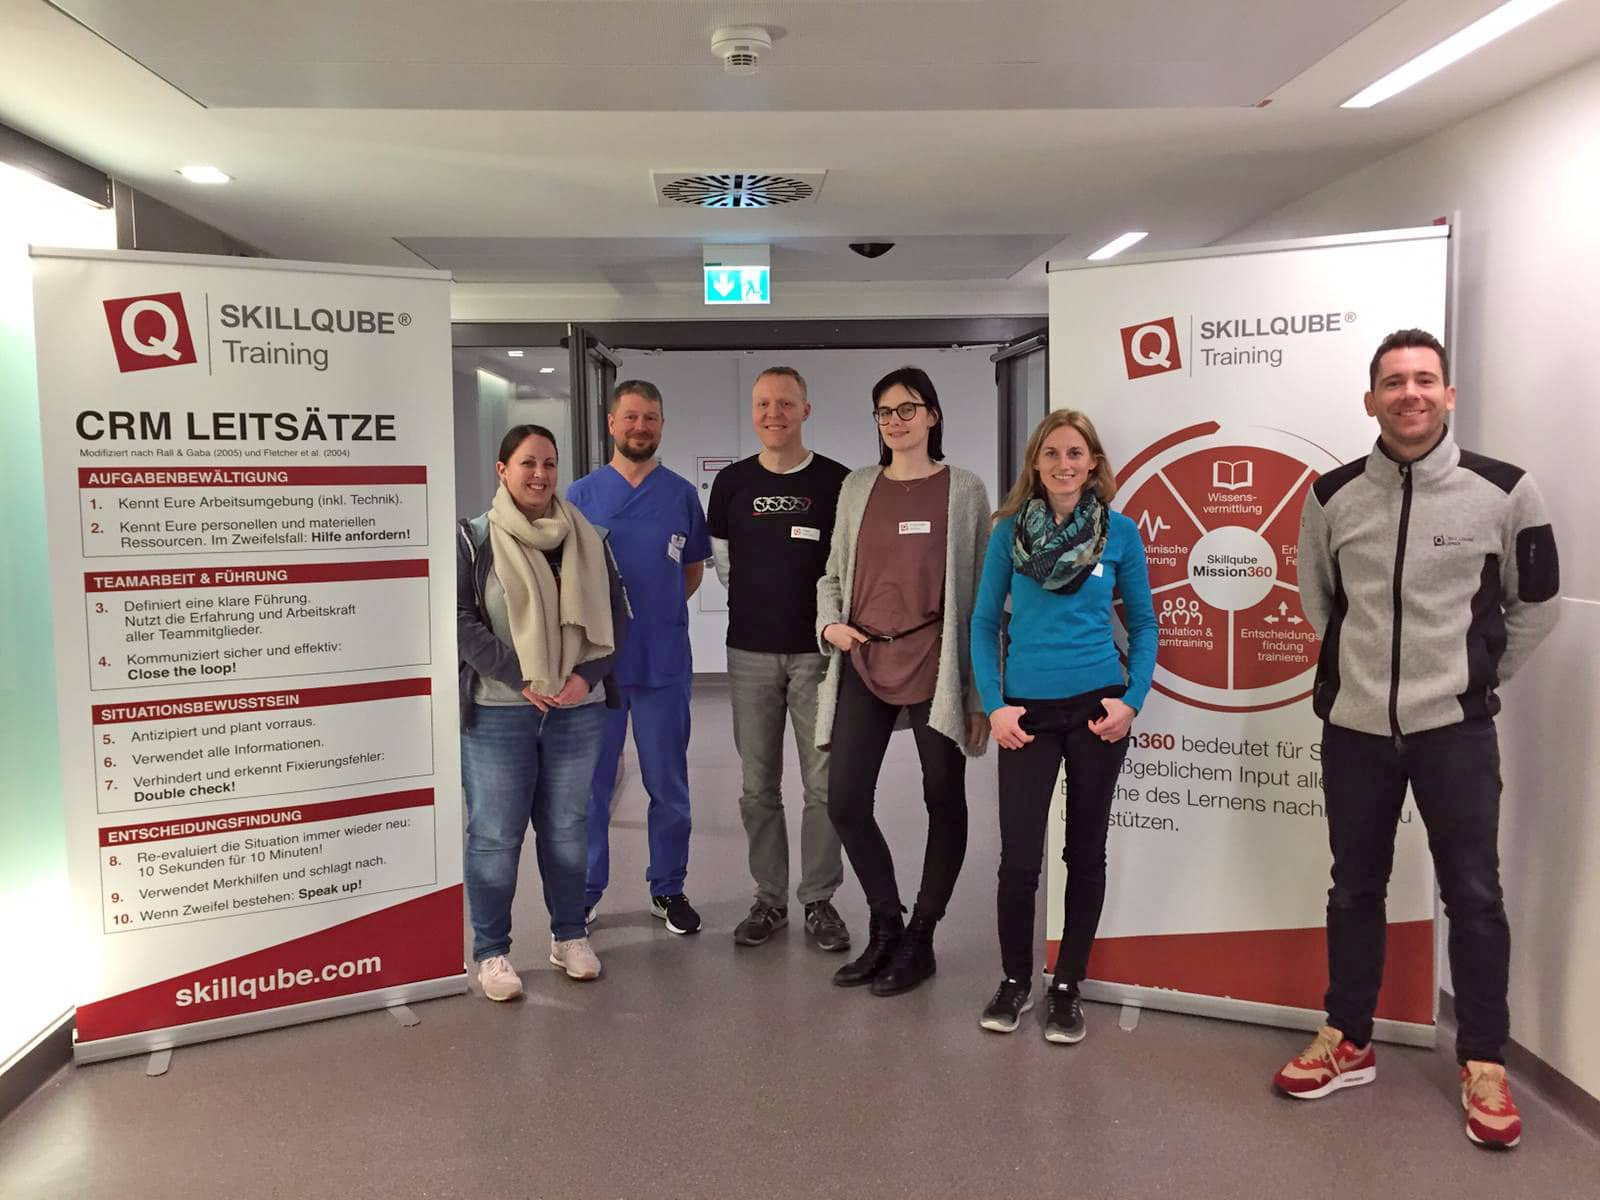 ACLS Provider & Refresher Kurs (AHA) in Bad Krozingen